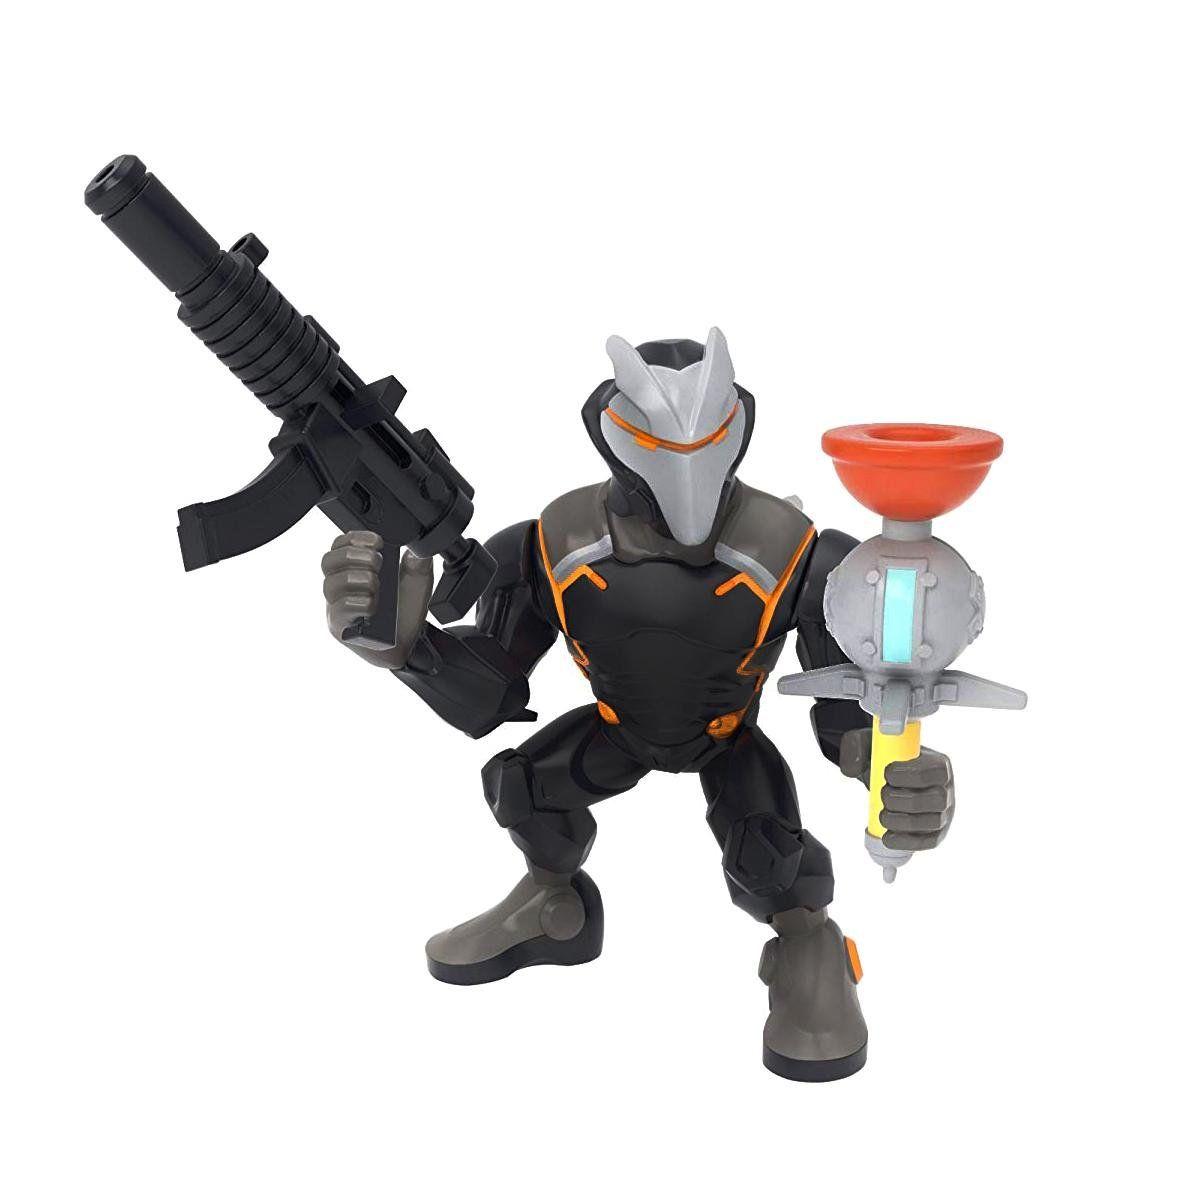 Fortnite 2 Mini Figuras - Omega & Brite Bomber - Original